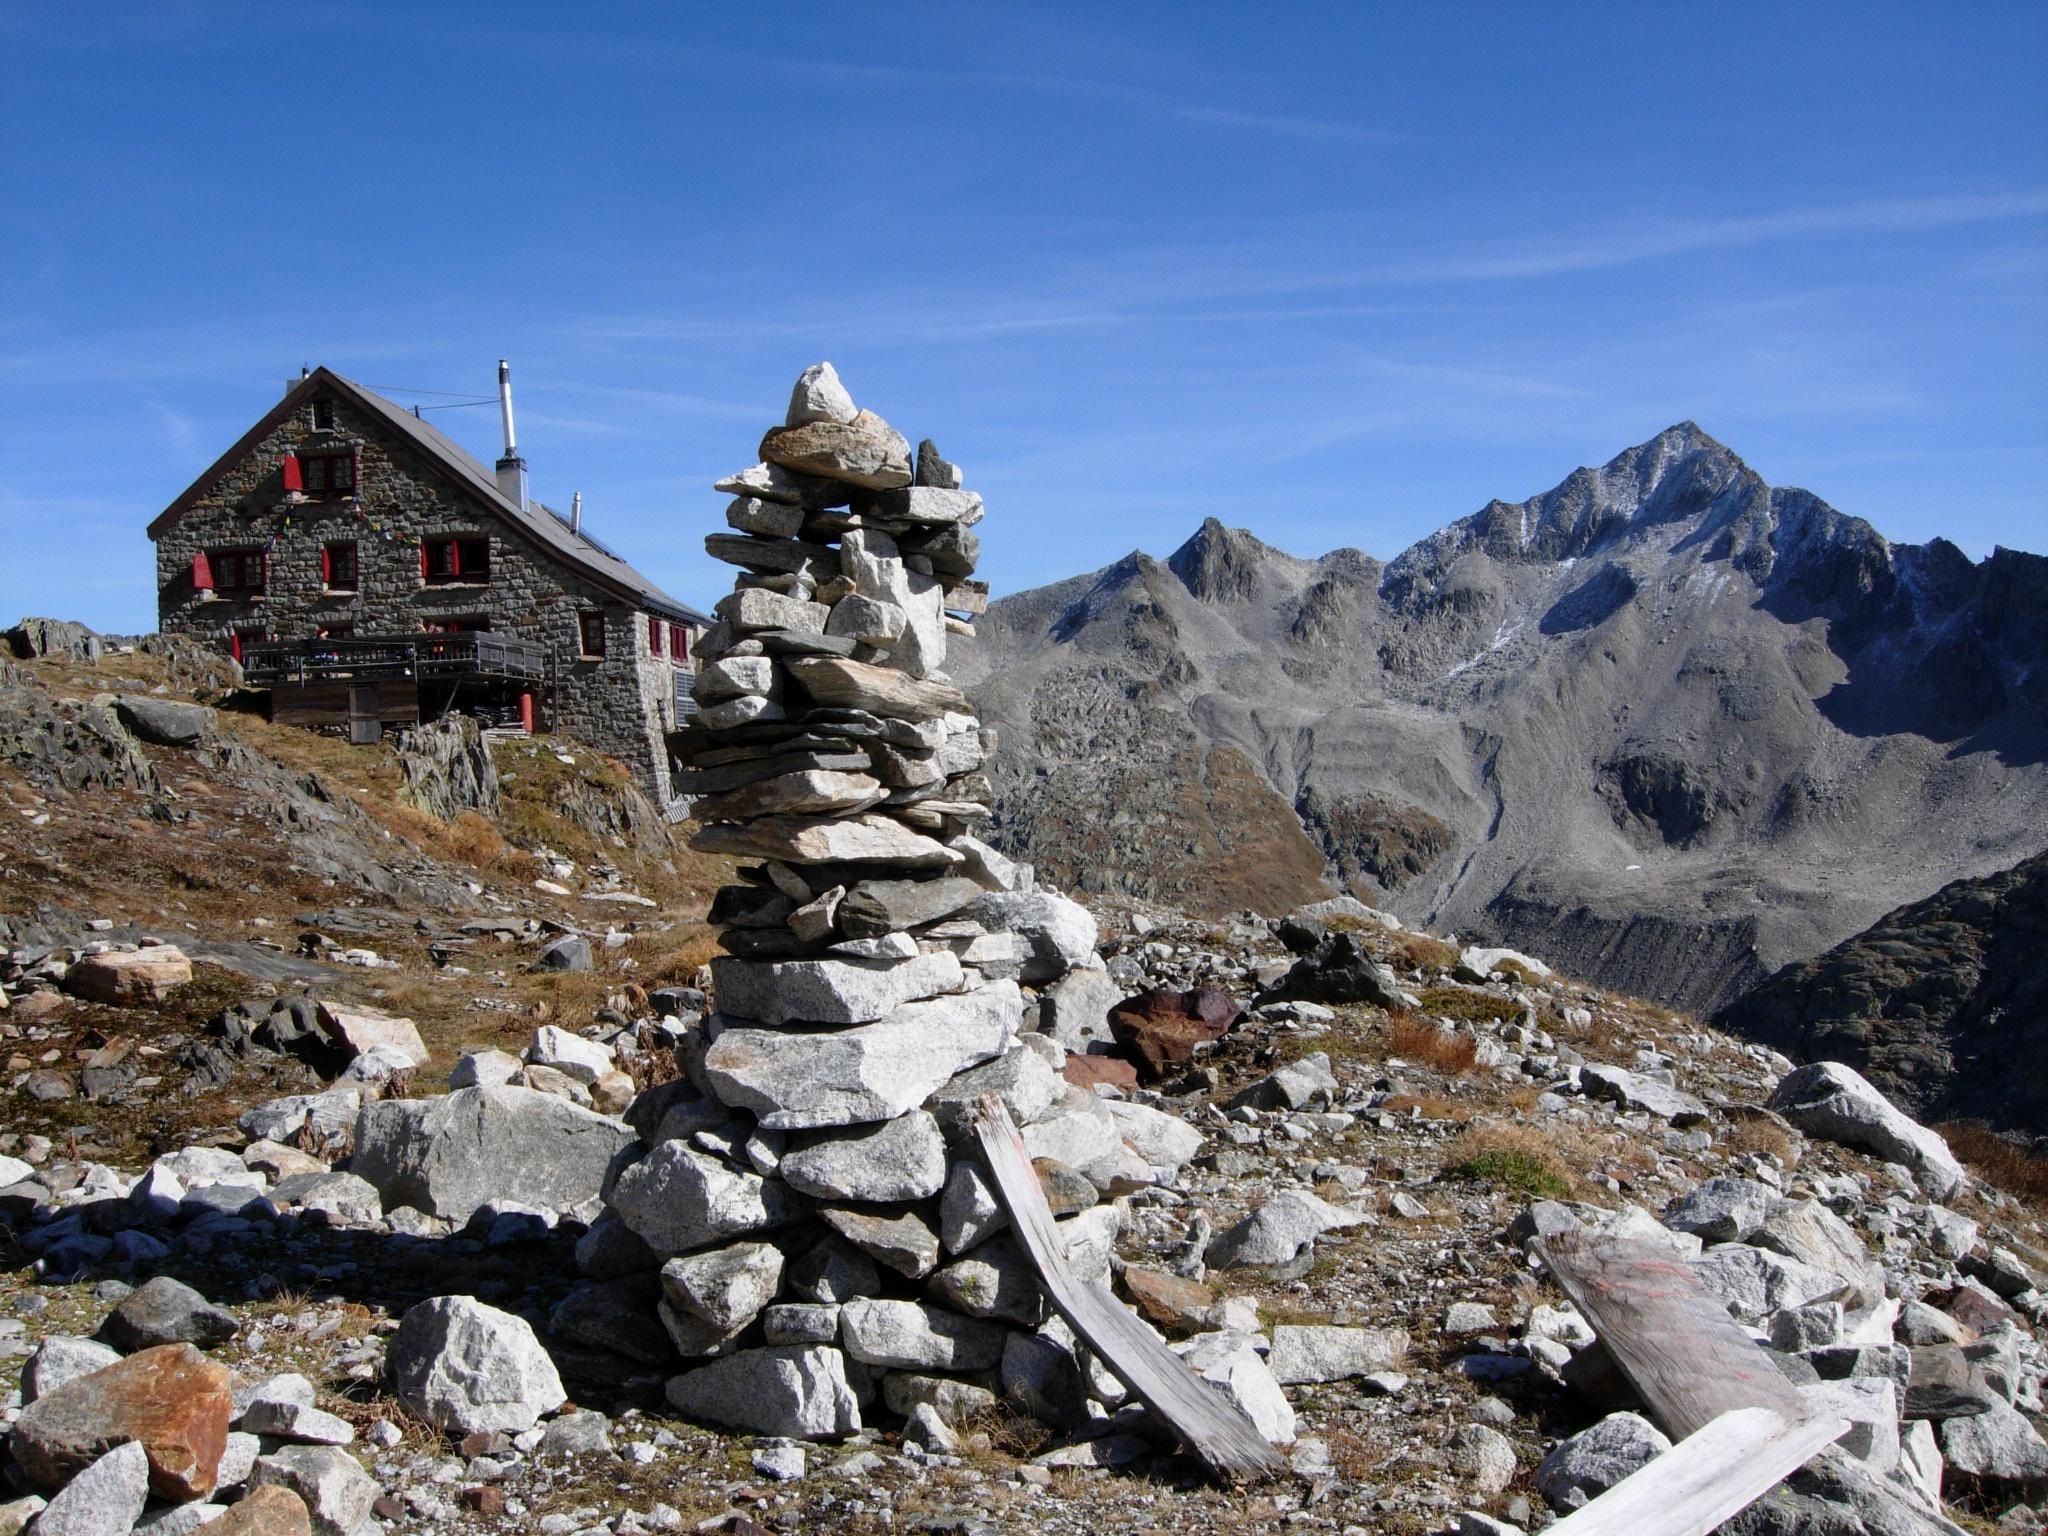 Rotondohütte SAC